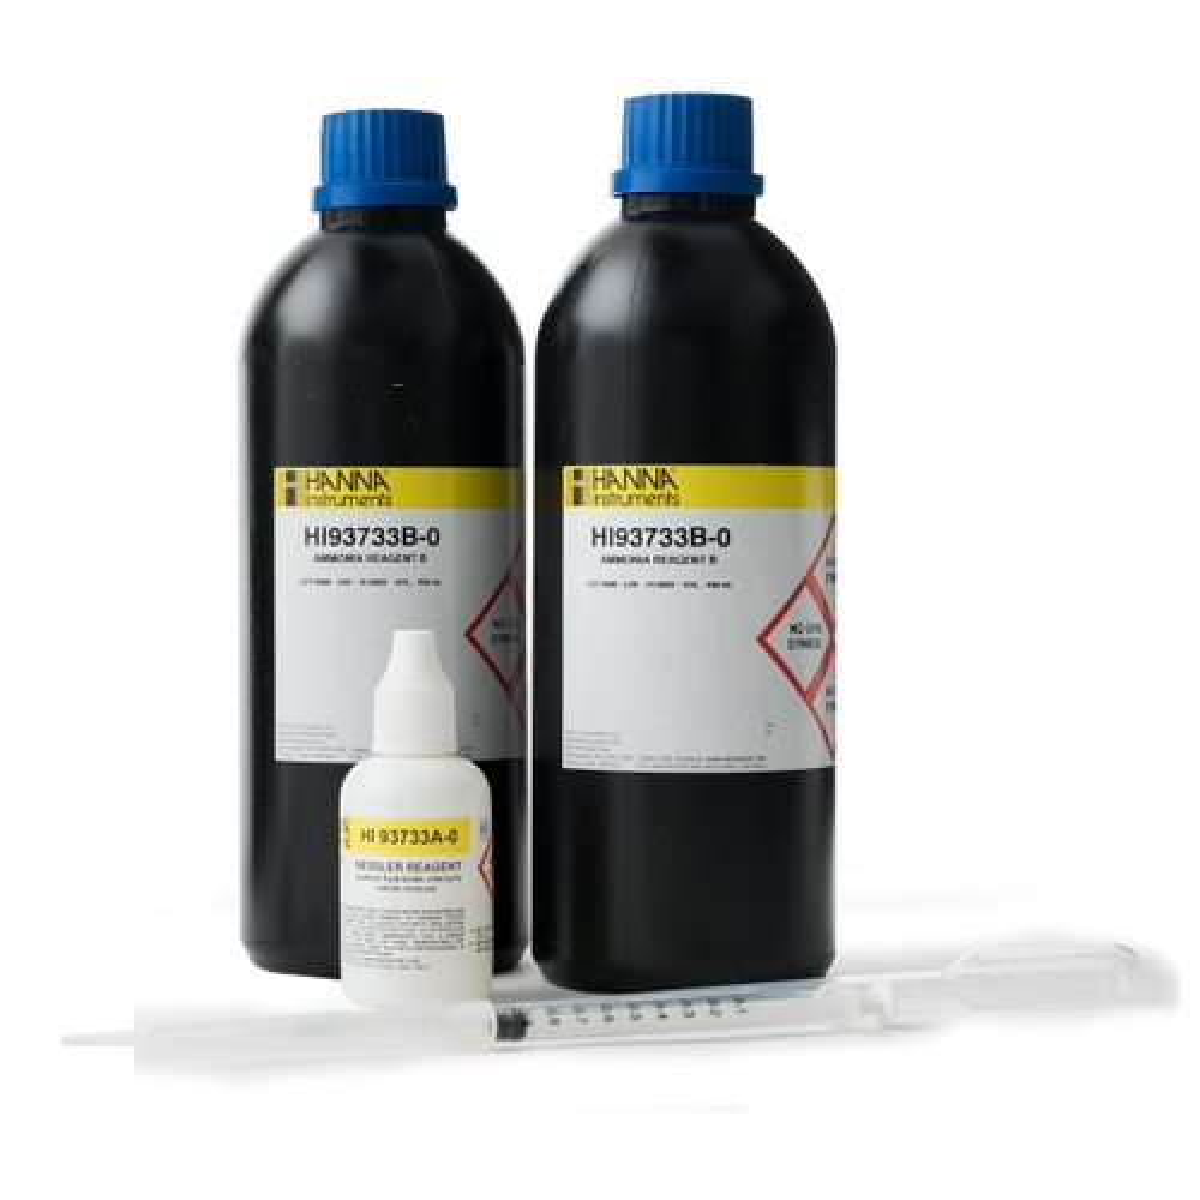 Ammonia High Range Reagents (100 tests) - HI93733-01